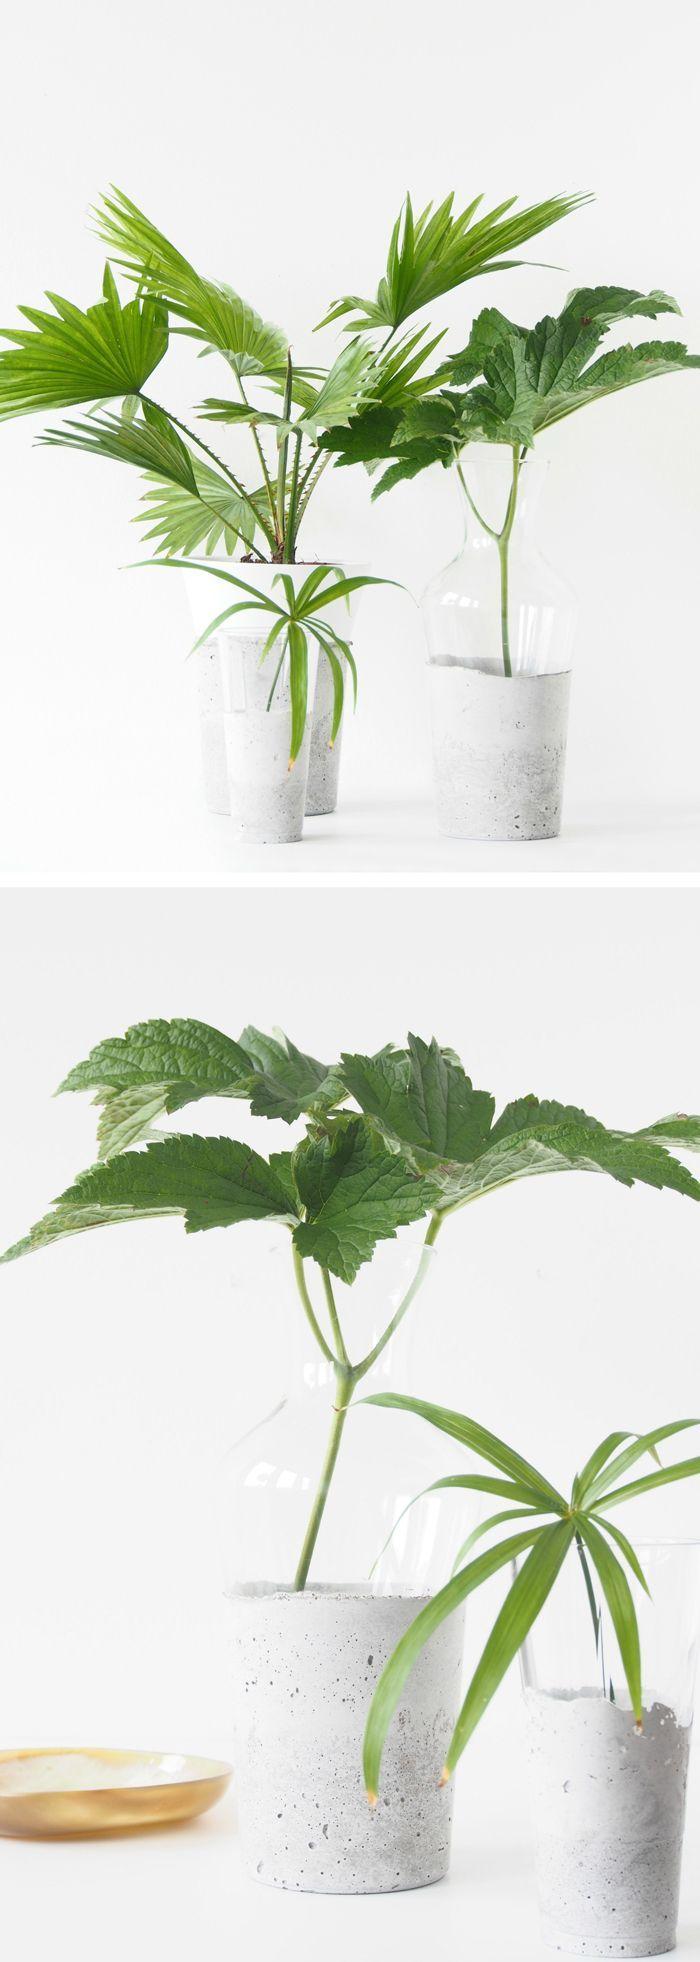 DIY Concrete & Glass Vases: